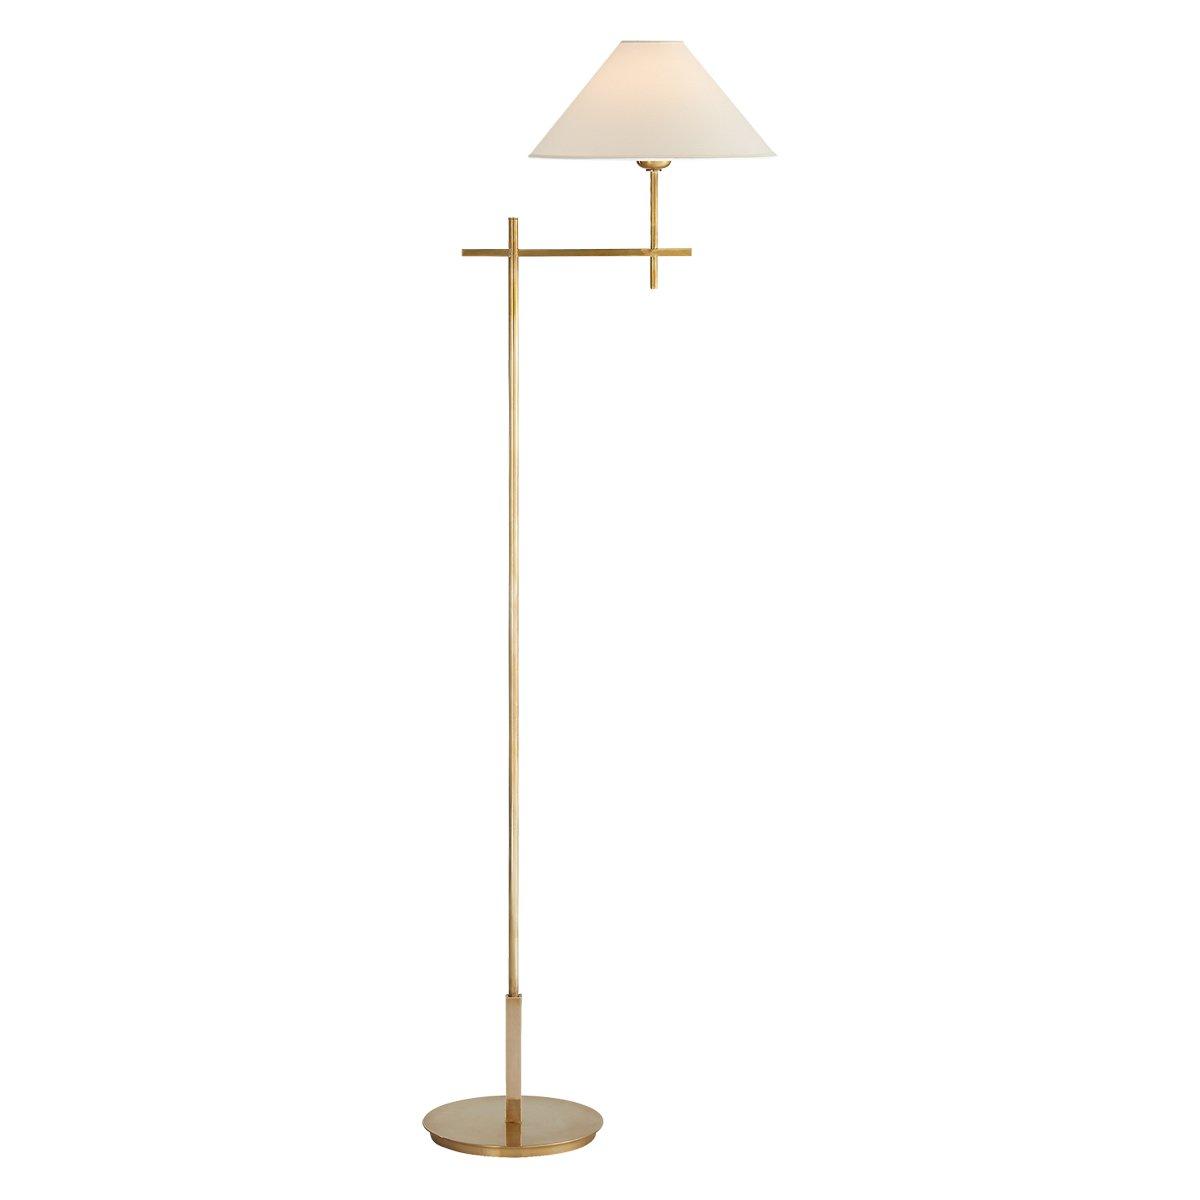 Hackney_Bridge_Arm_Floor_Lamp_2.jpg